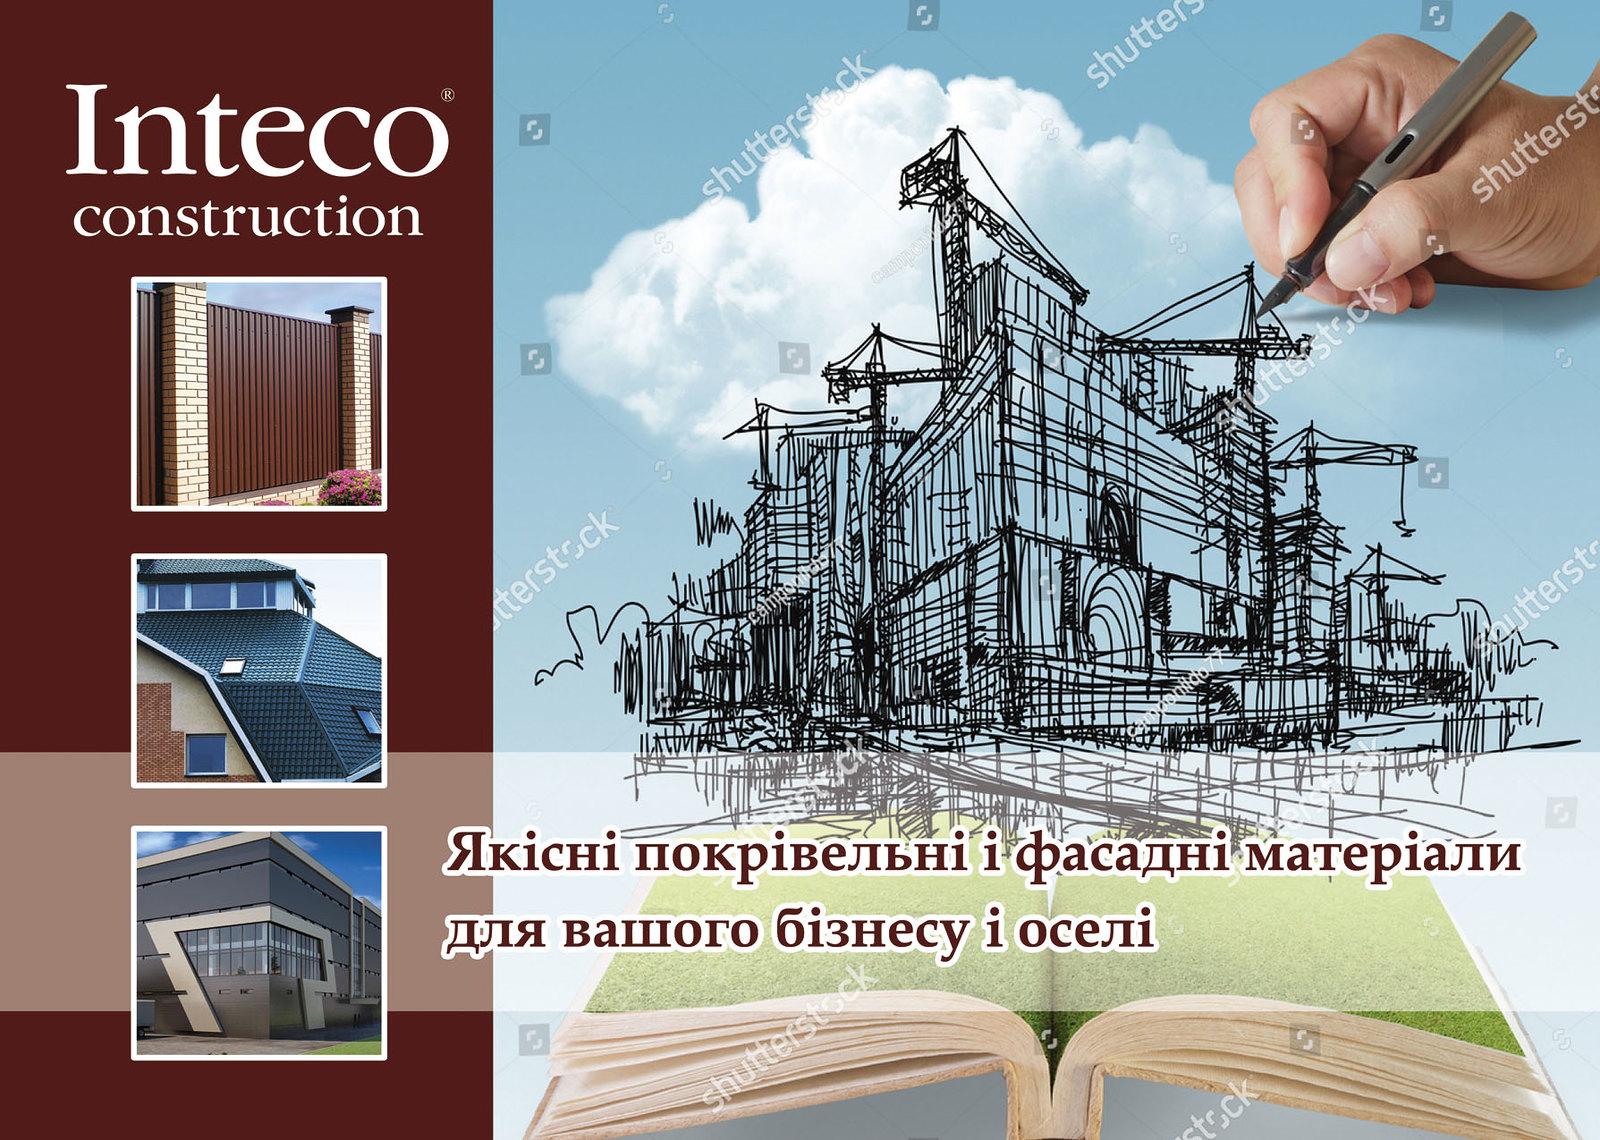 (01) Kalend Inteco 01 verh 01